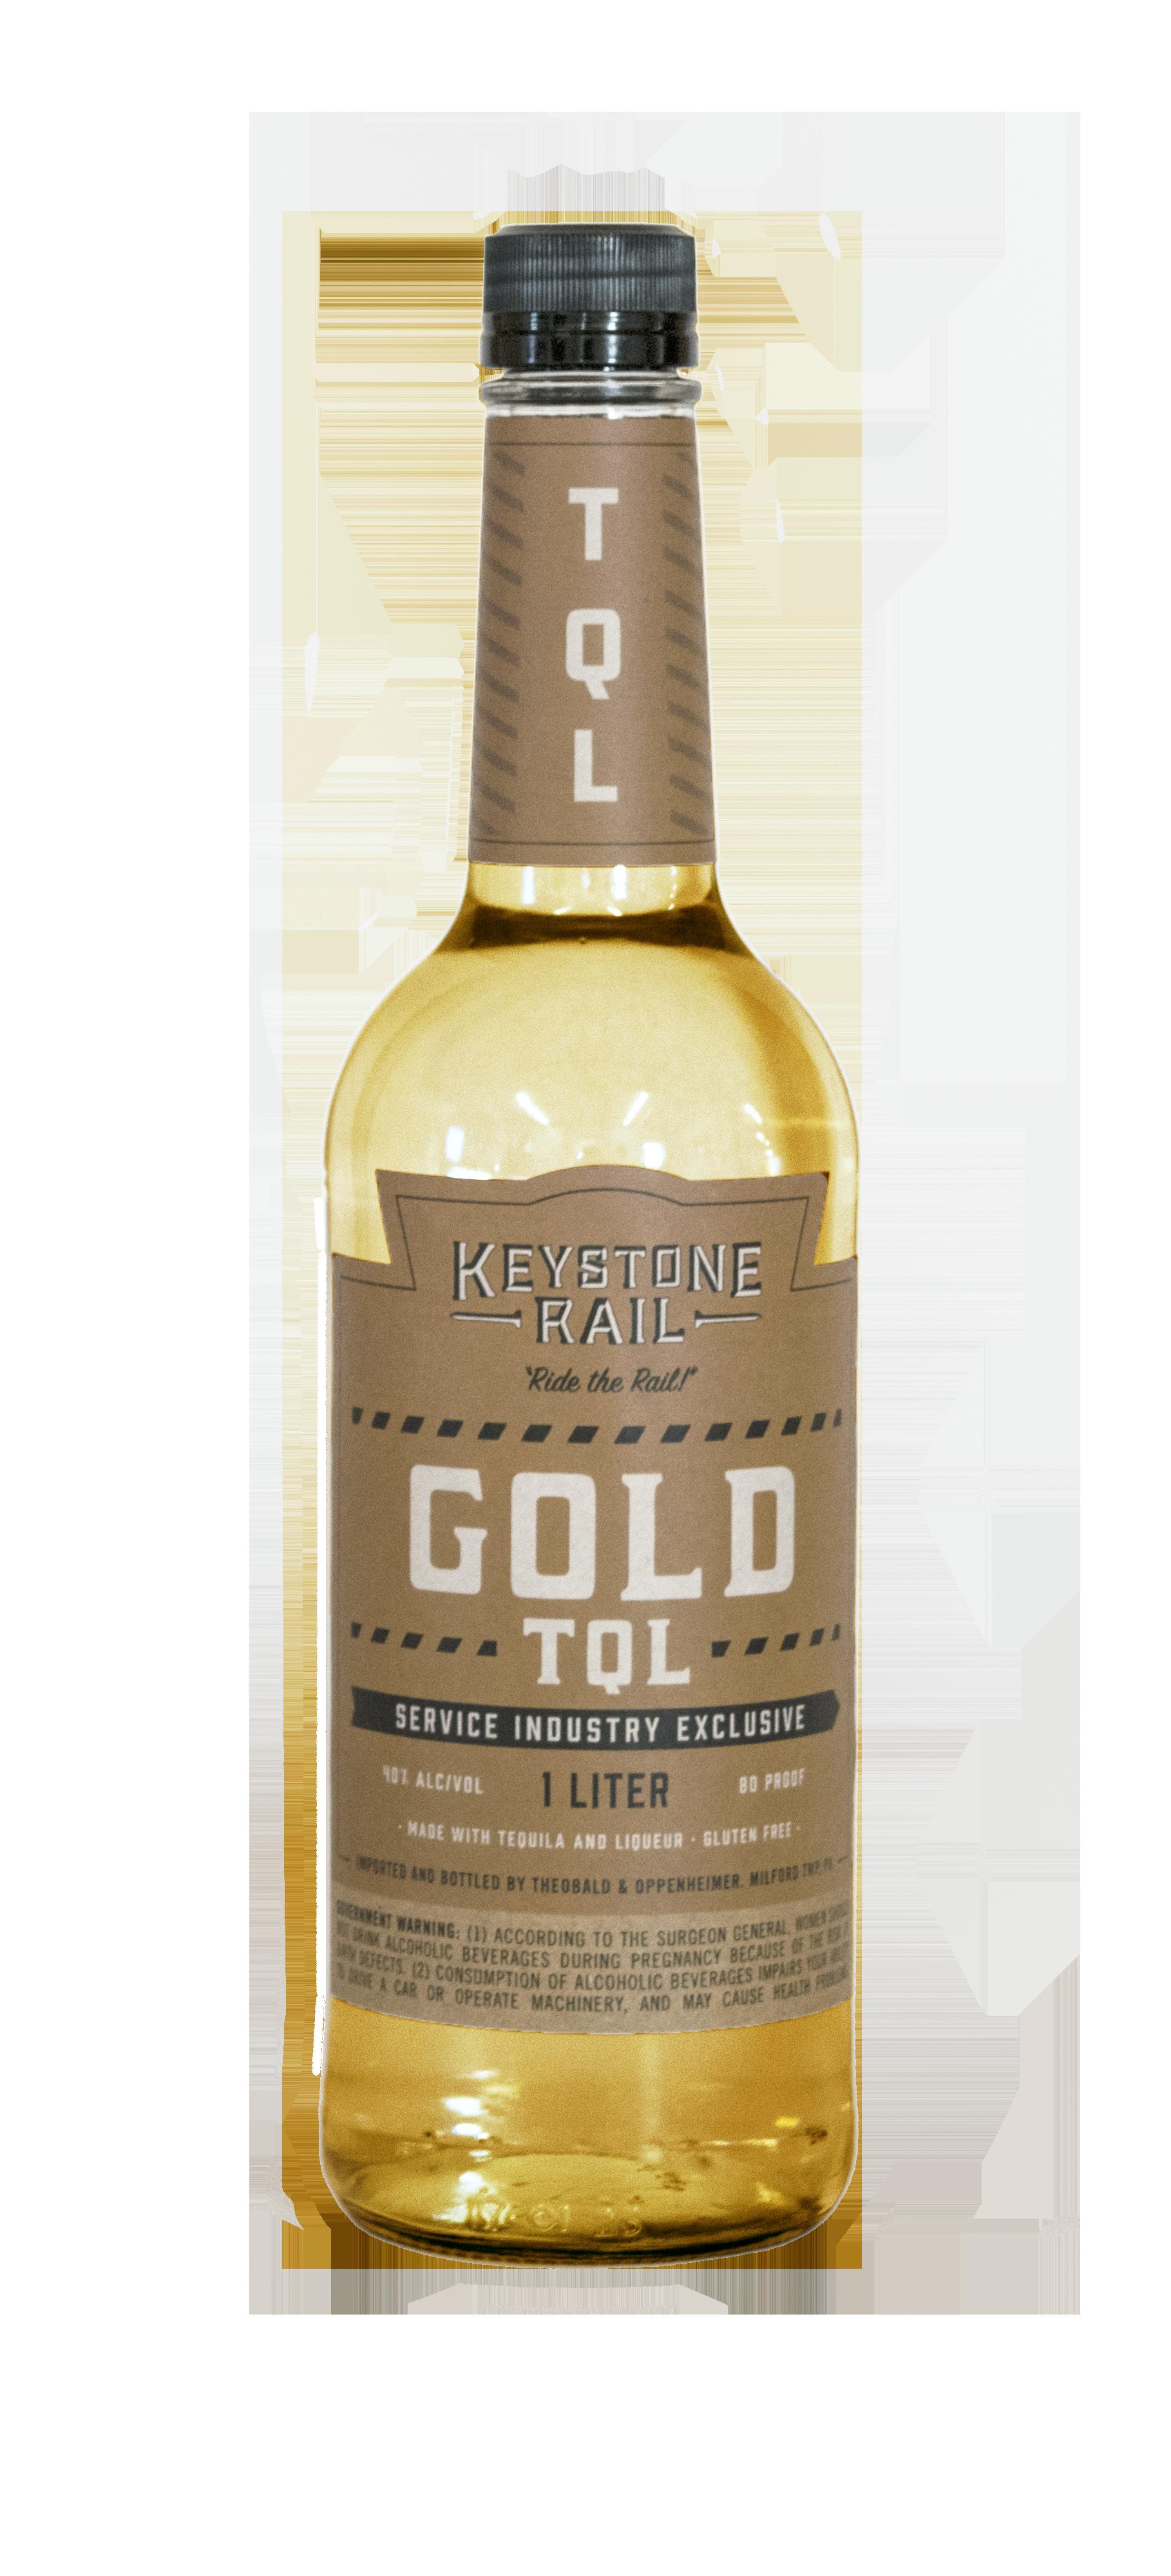 Keystone Rail Gold Tequila